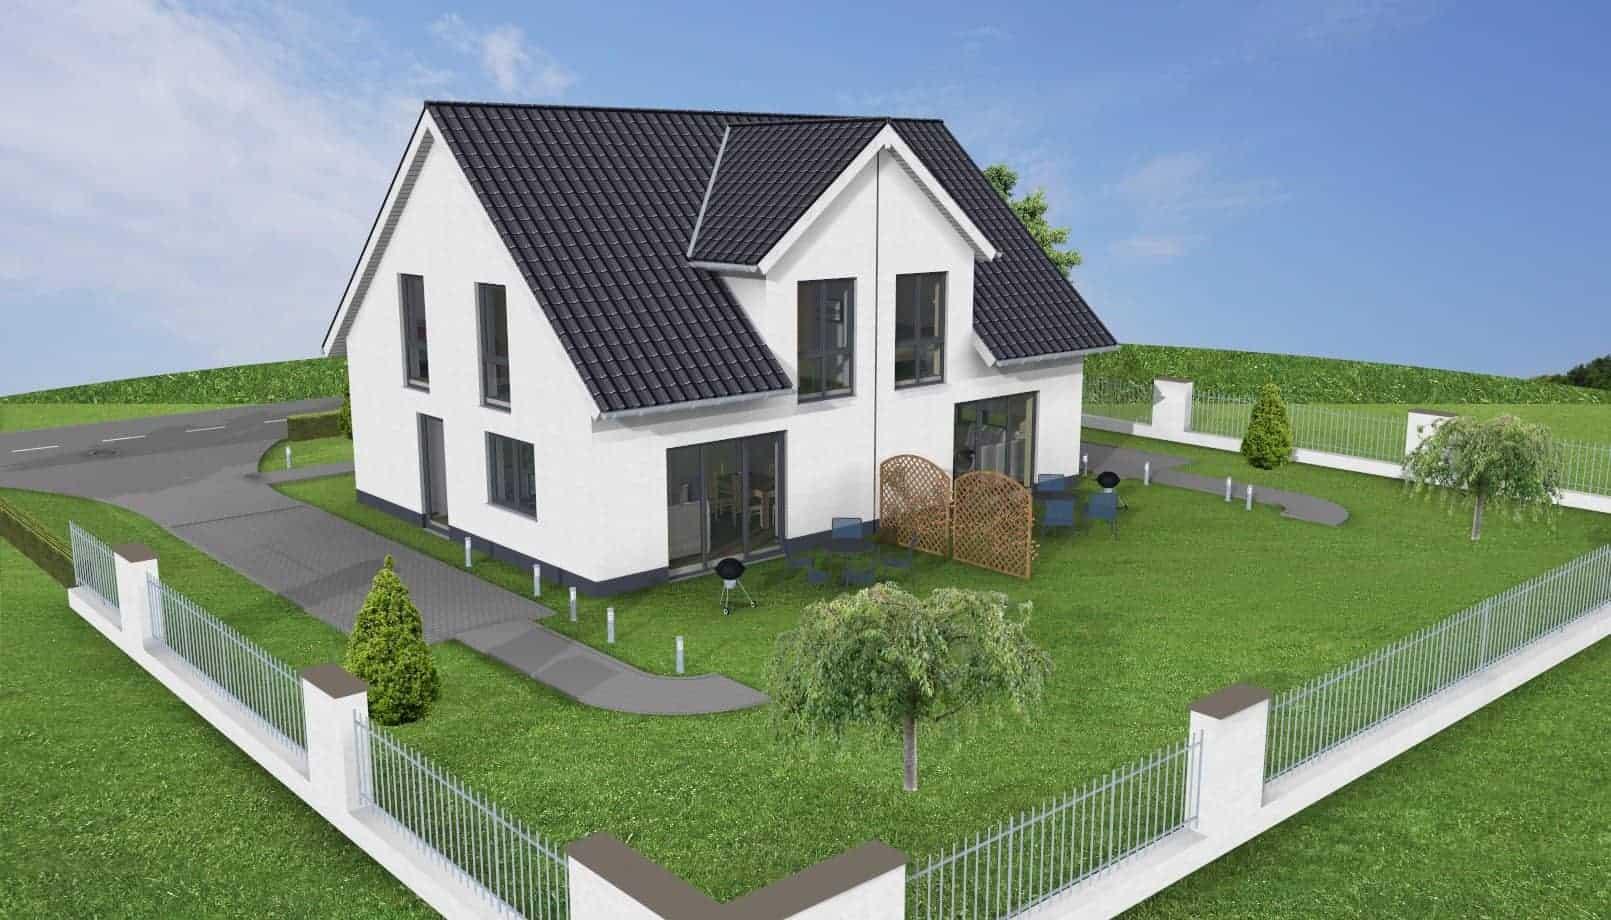 doppelhaus klassik massivhausbau made in th ringen. Black Bedroom Furniture Sets. Home Design Ideas